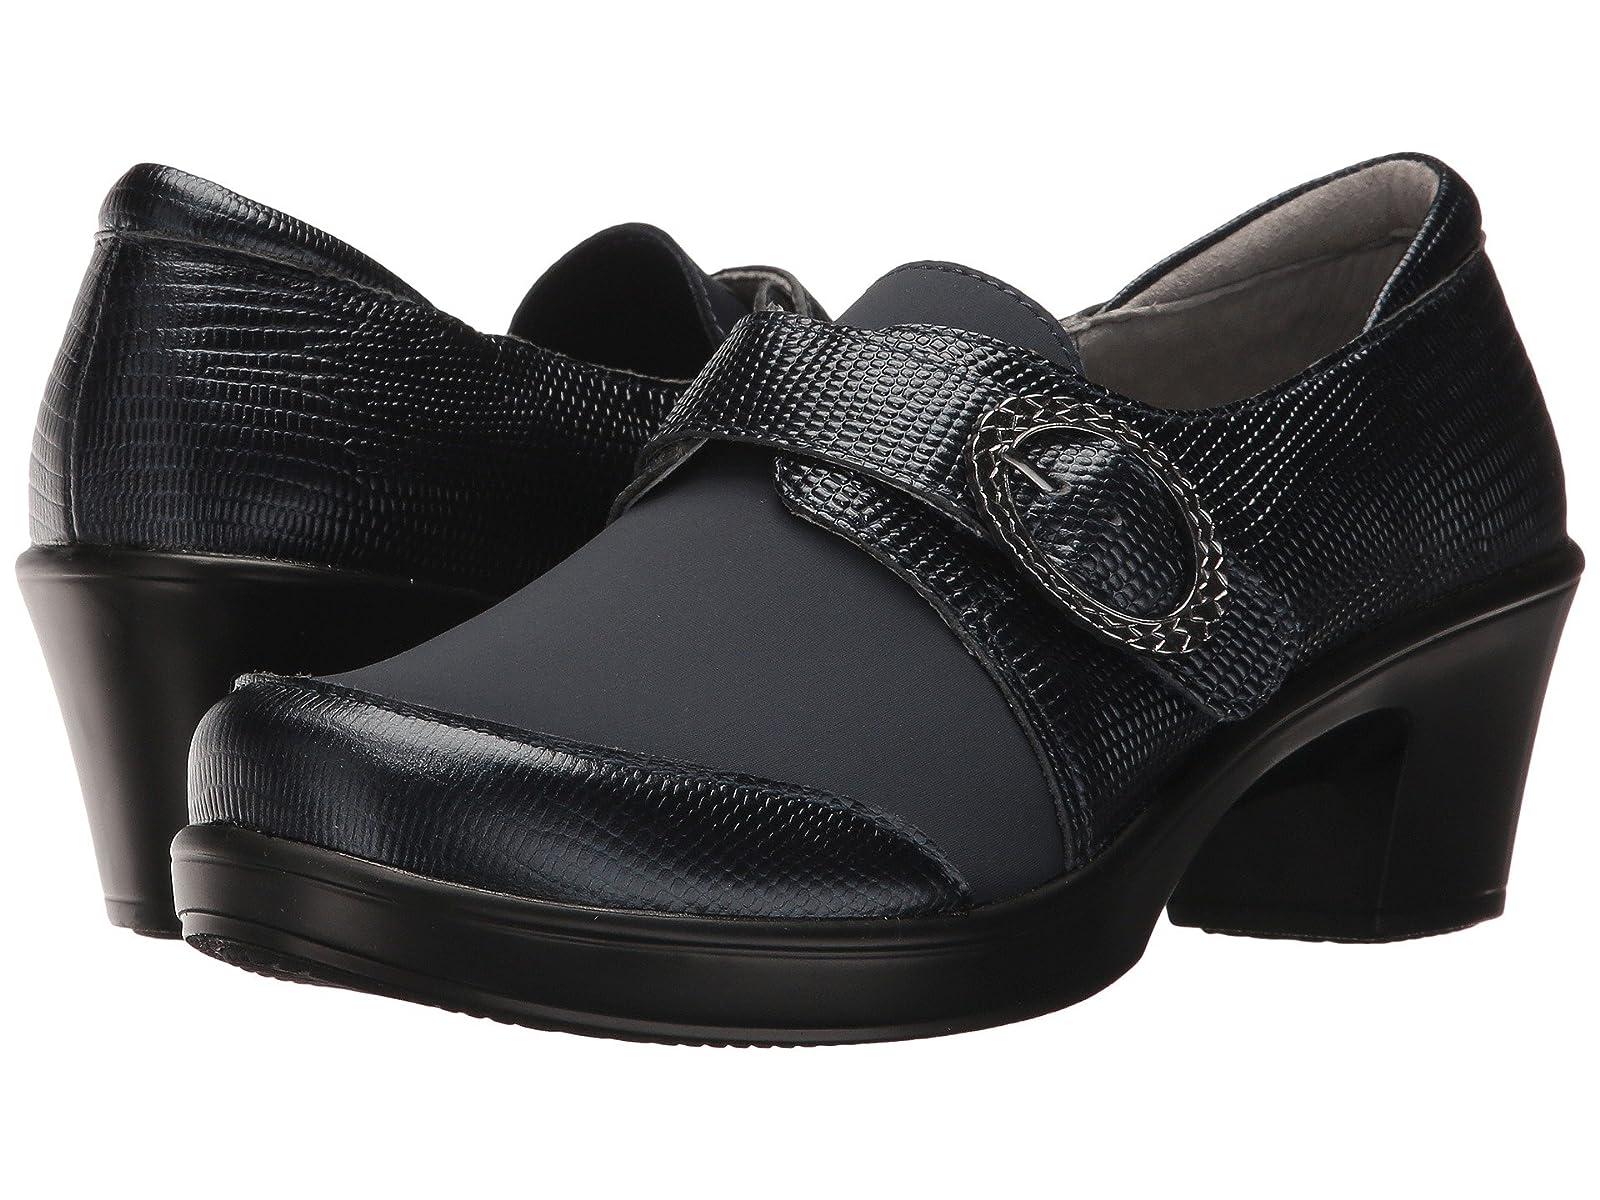 Alegria HolliAtmospheric grades have affordable shoes